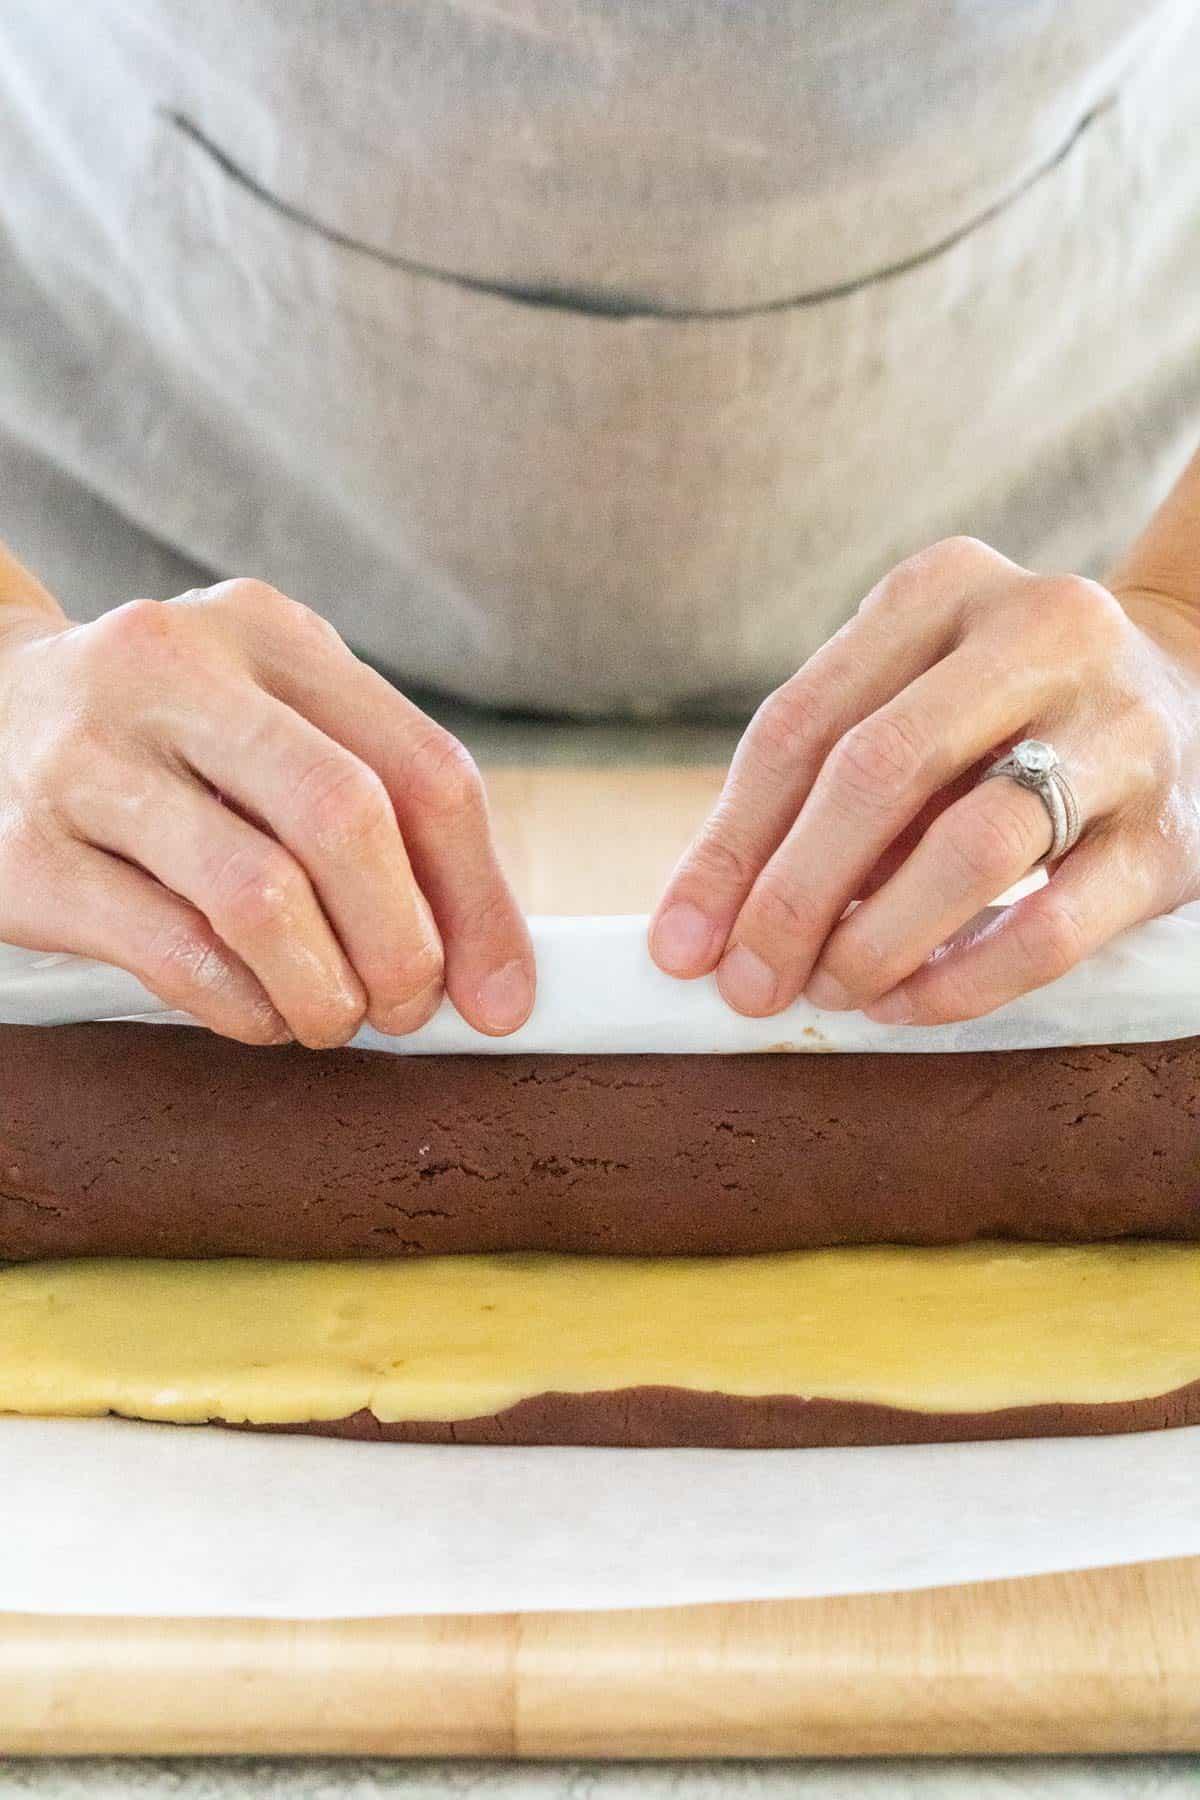 Rolling dough into a long tube